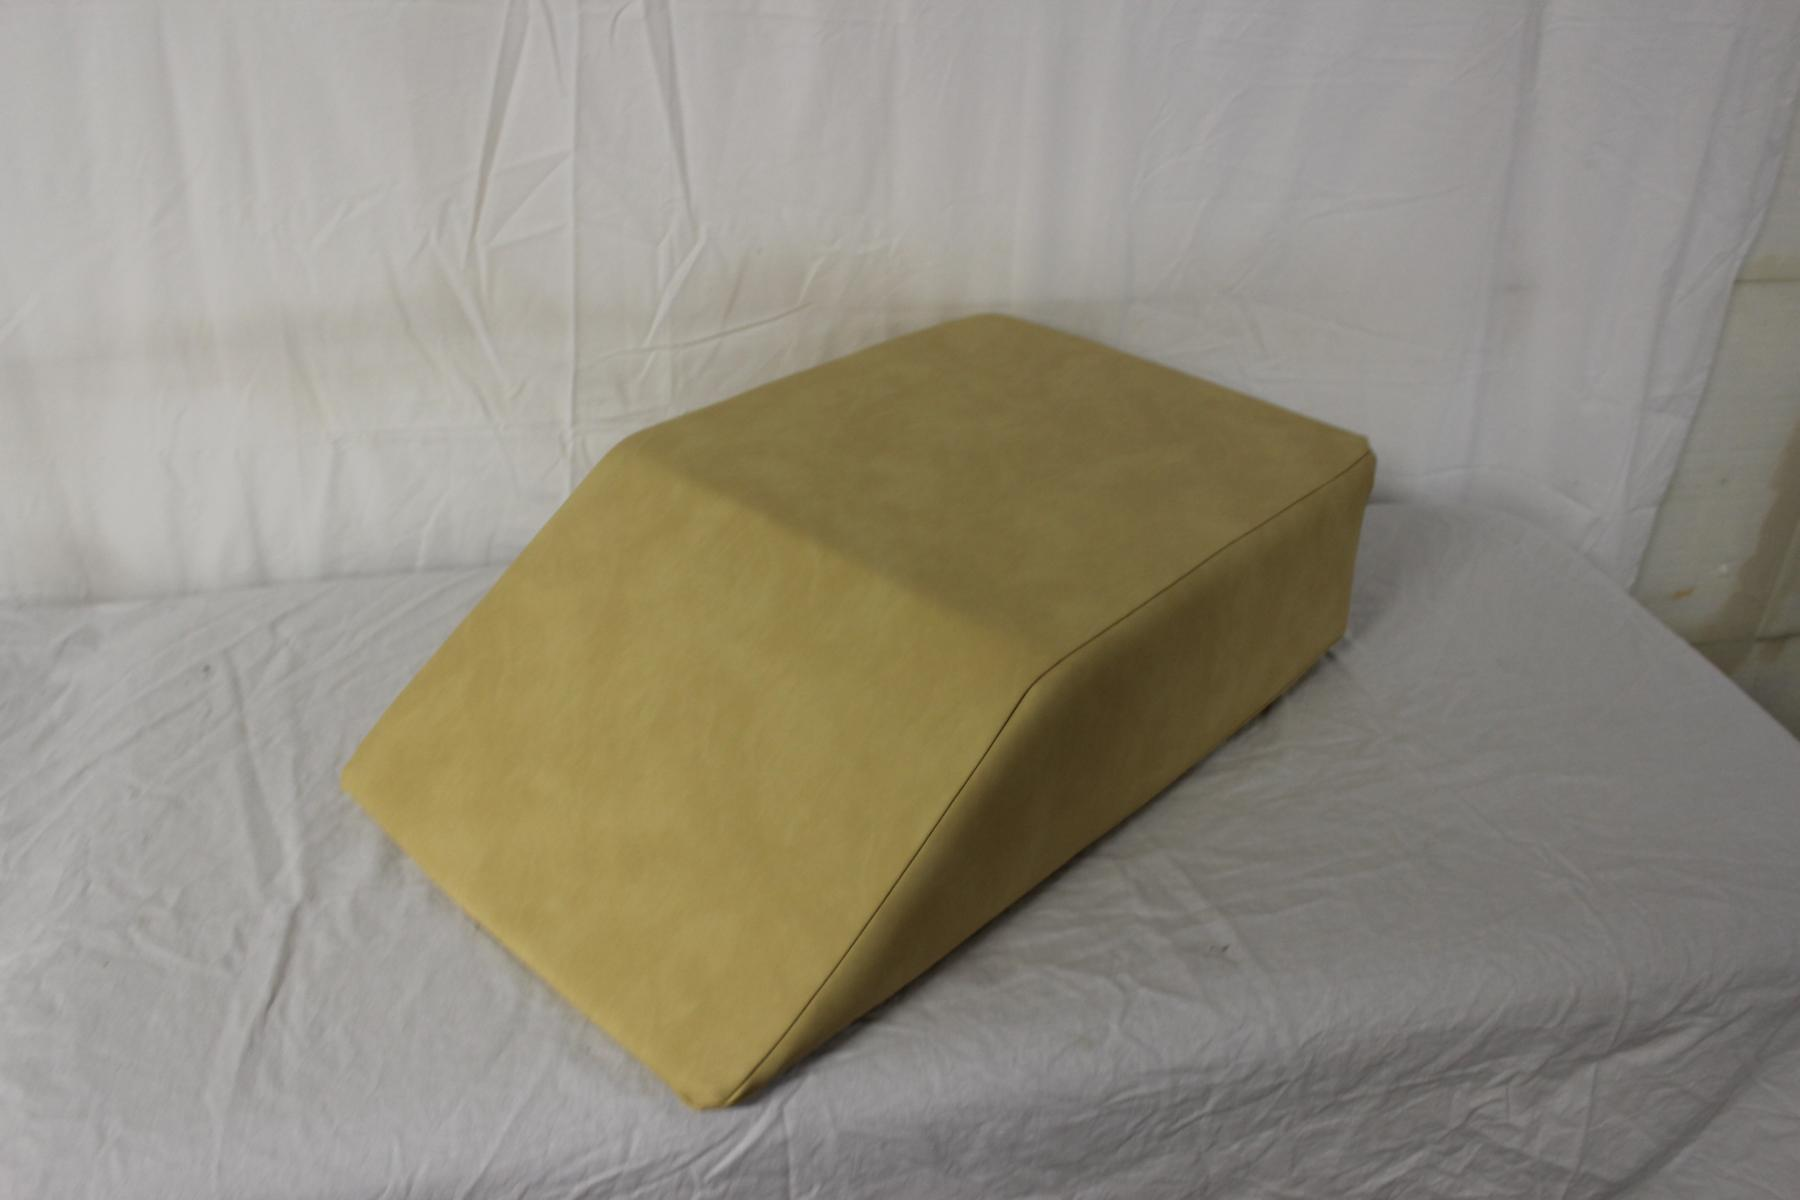 Lamphdrainagekeil ohne Beinmulden - Farbe: Palma-gobi - NEUWARE